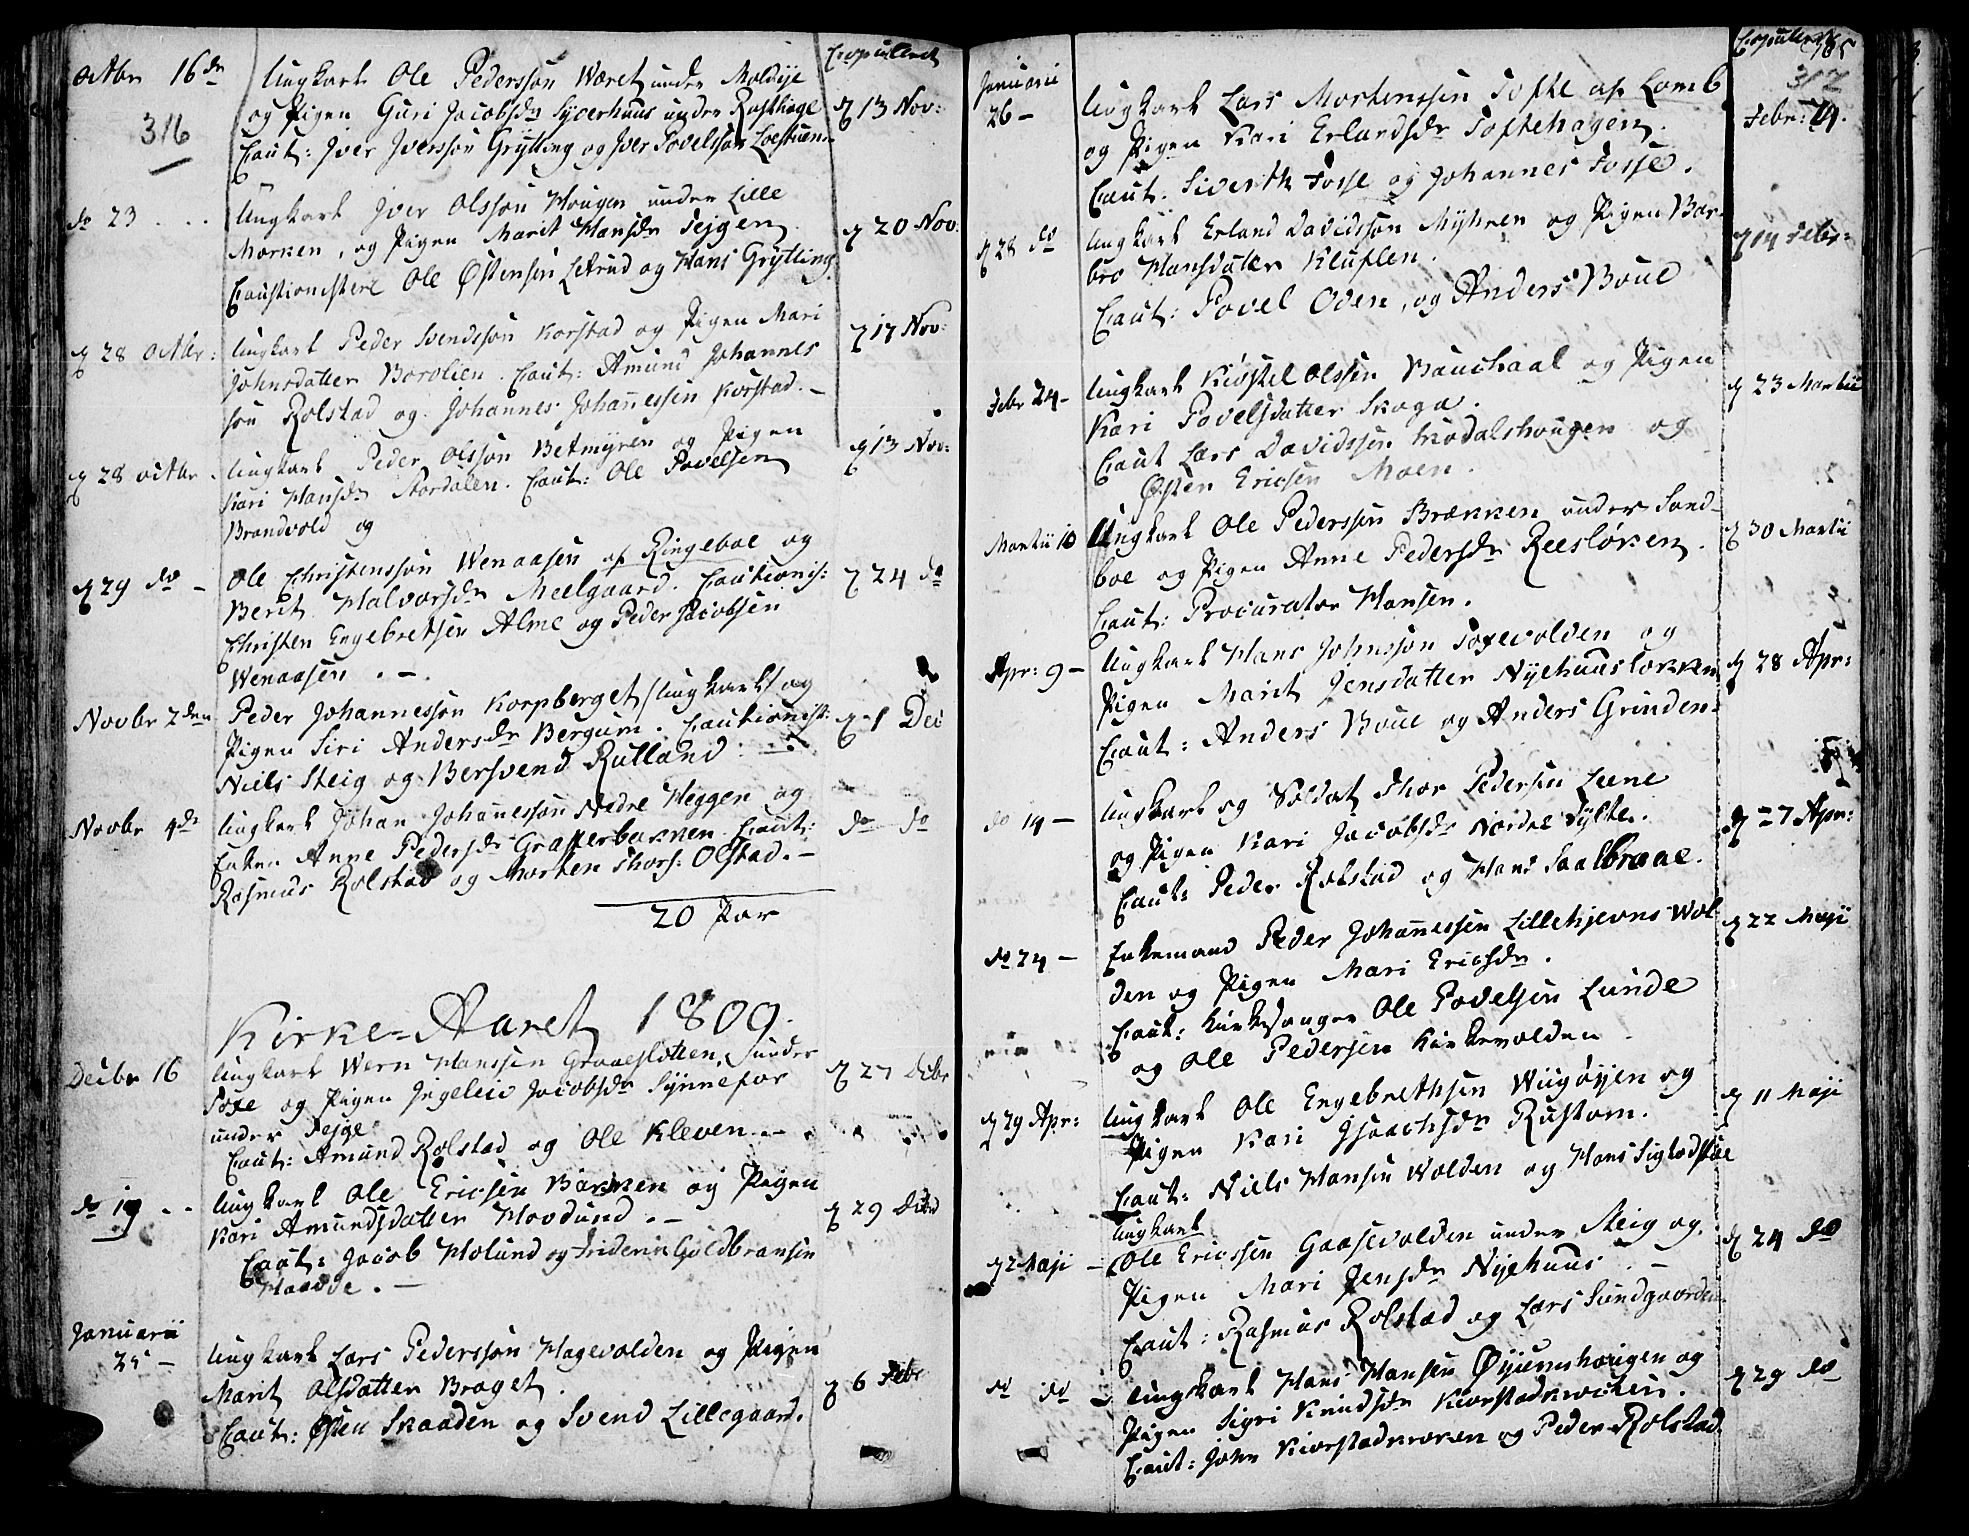 SAH, Fron prestekontor, H/Ha/Haa/L0001: Ministerialbok nr. 1, 1799-1816, s. 316-317